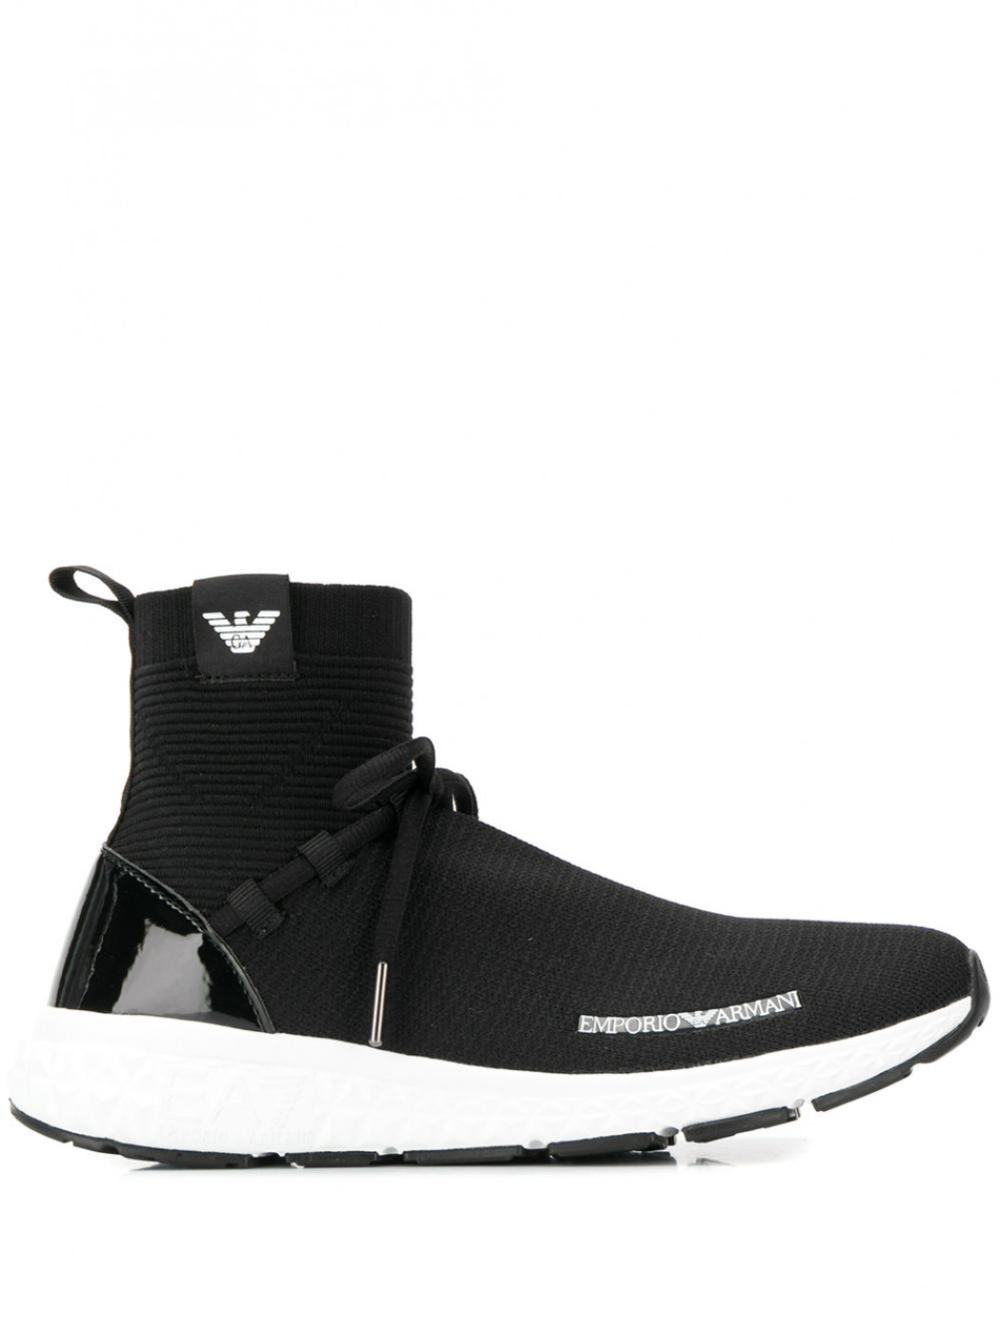 Emporio Armani Trainers Sneaker Socks Sneakers White Armani Socks Socks Sneakers Sneakers